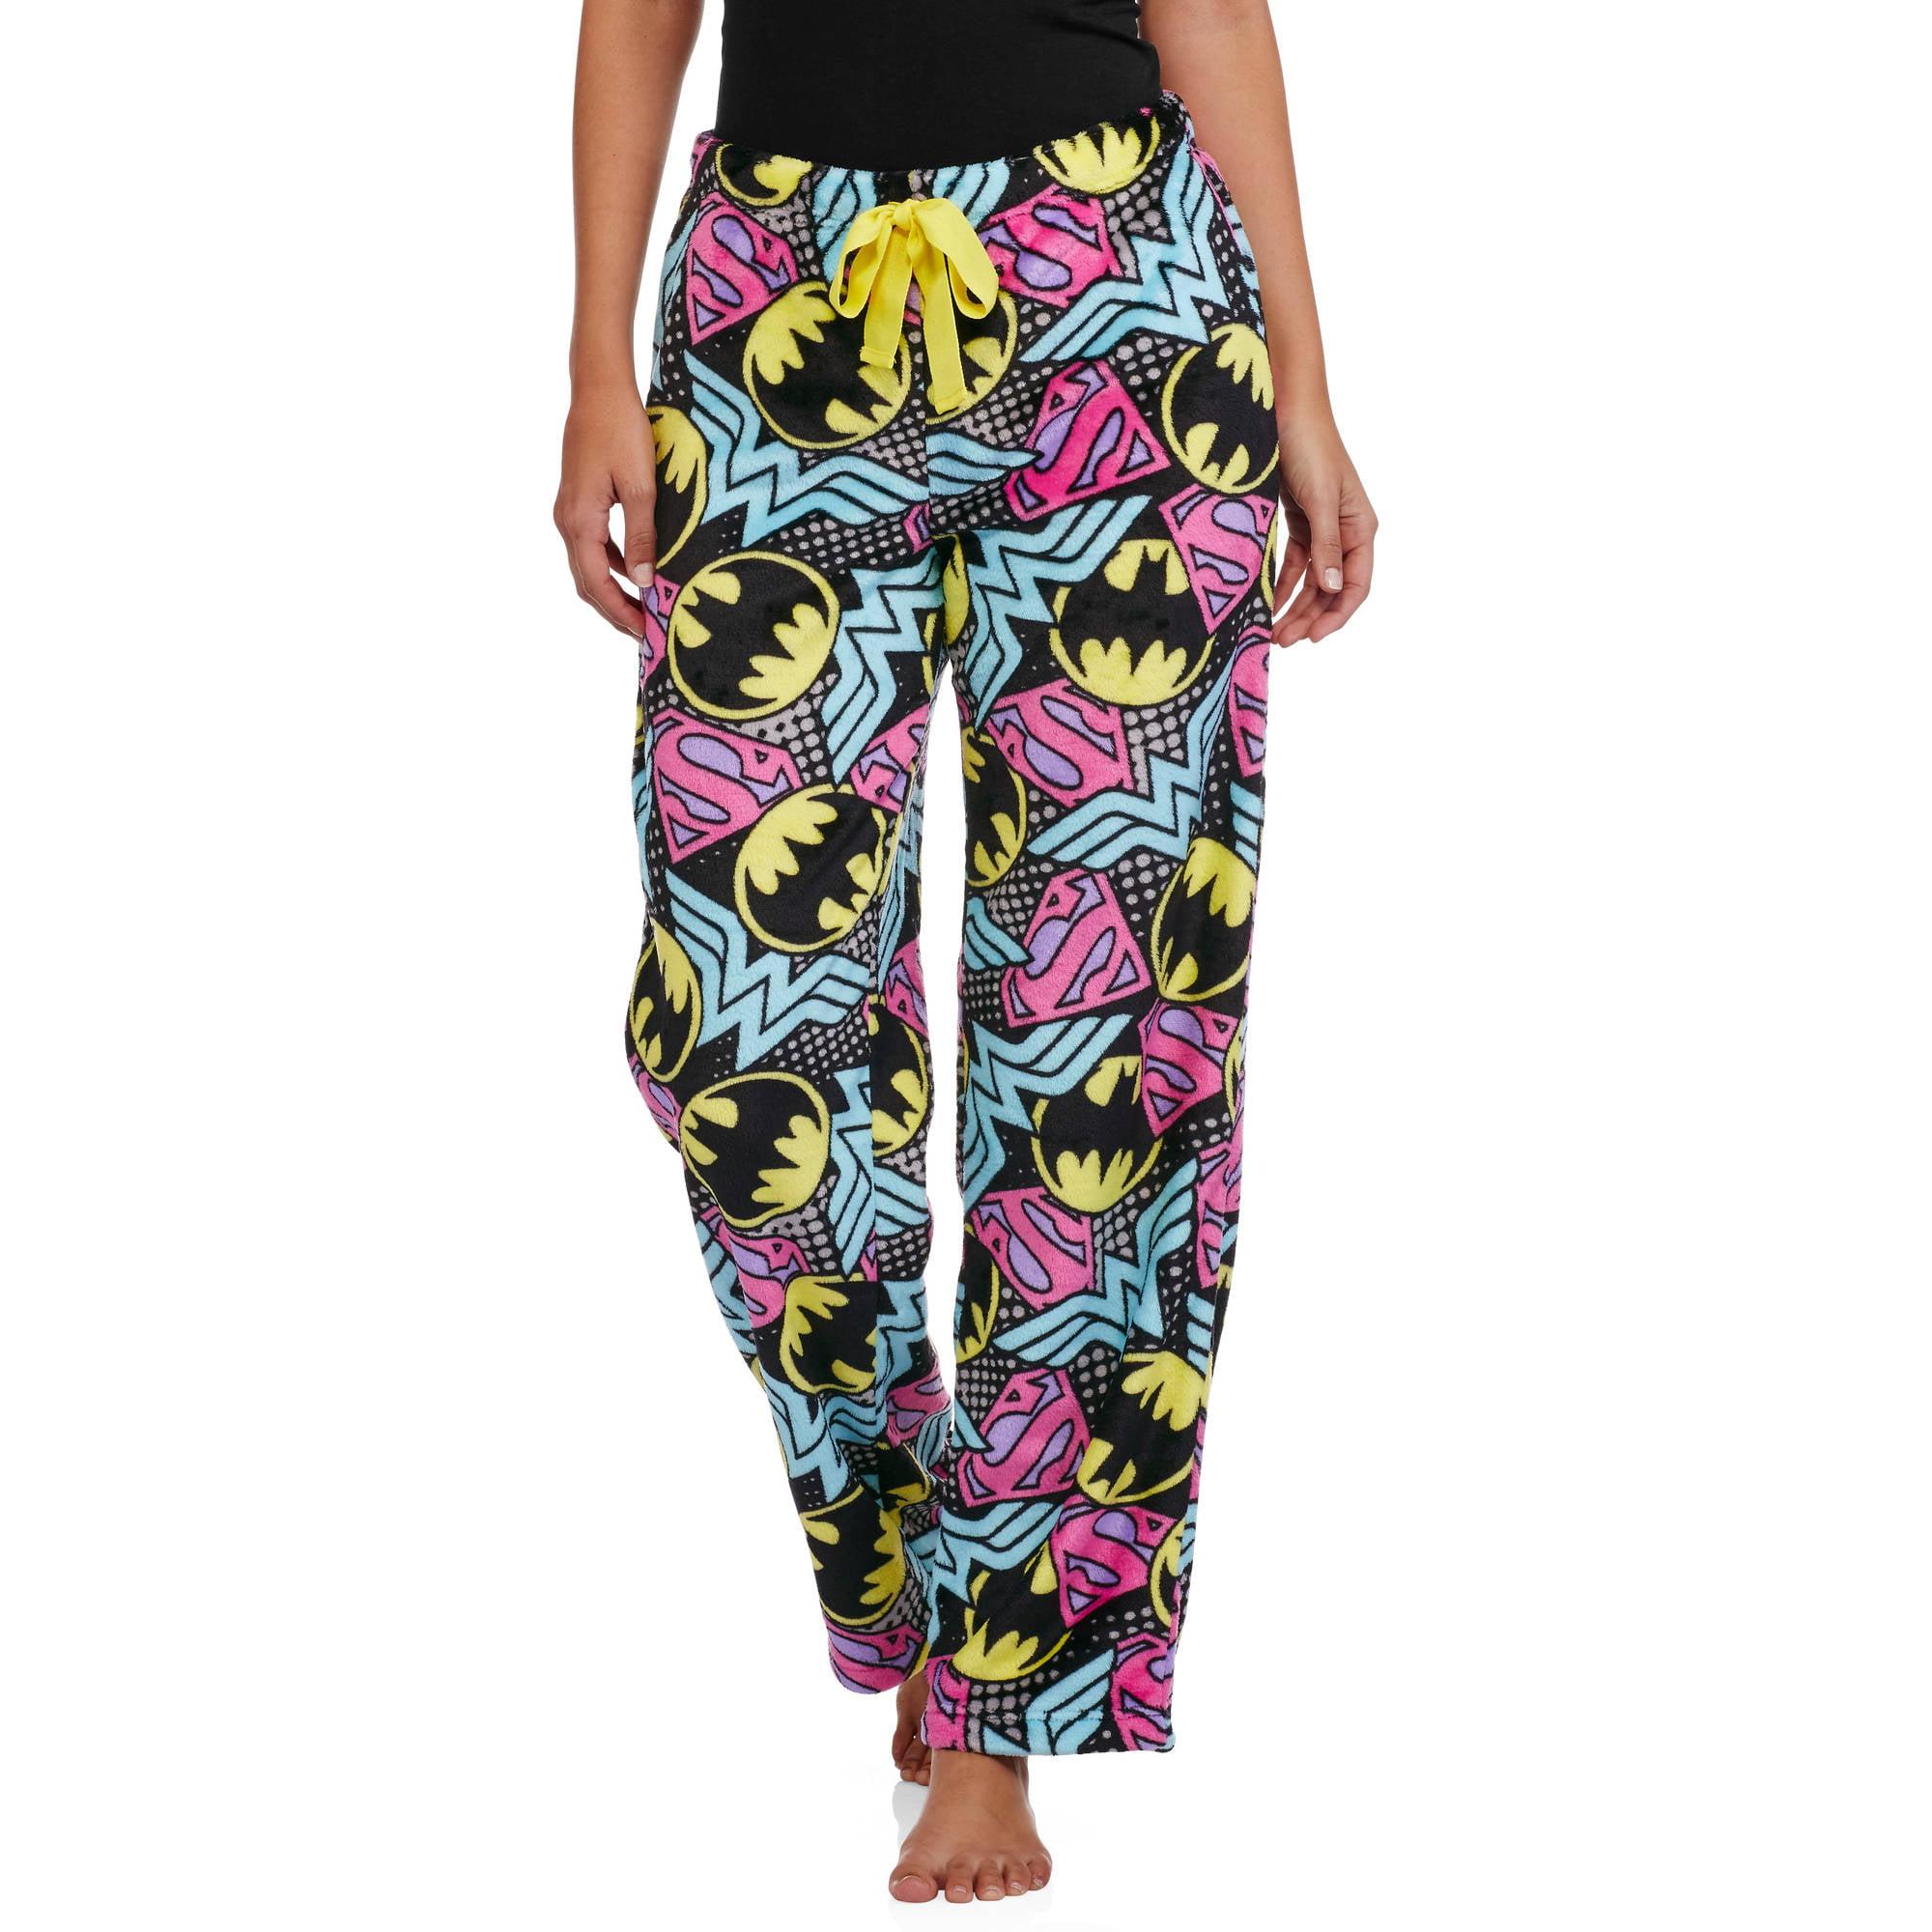 DC Comics Women's License Pajama Super Minky Plush Fleece Sleep Pant